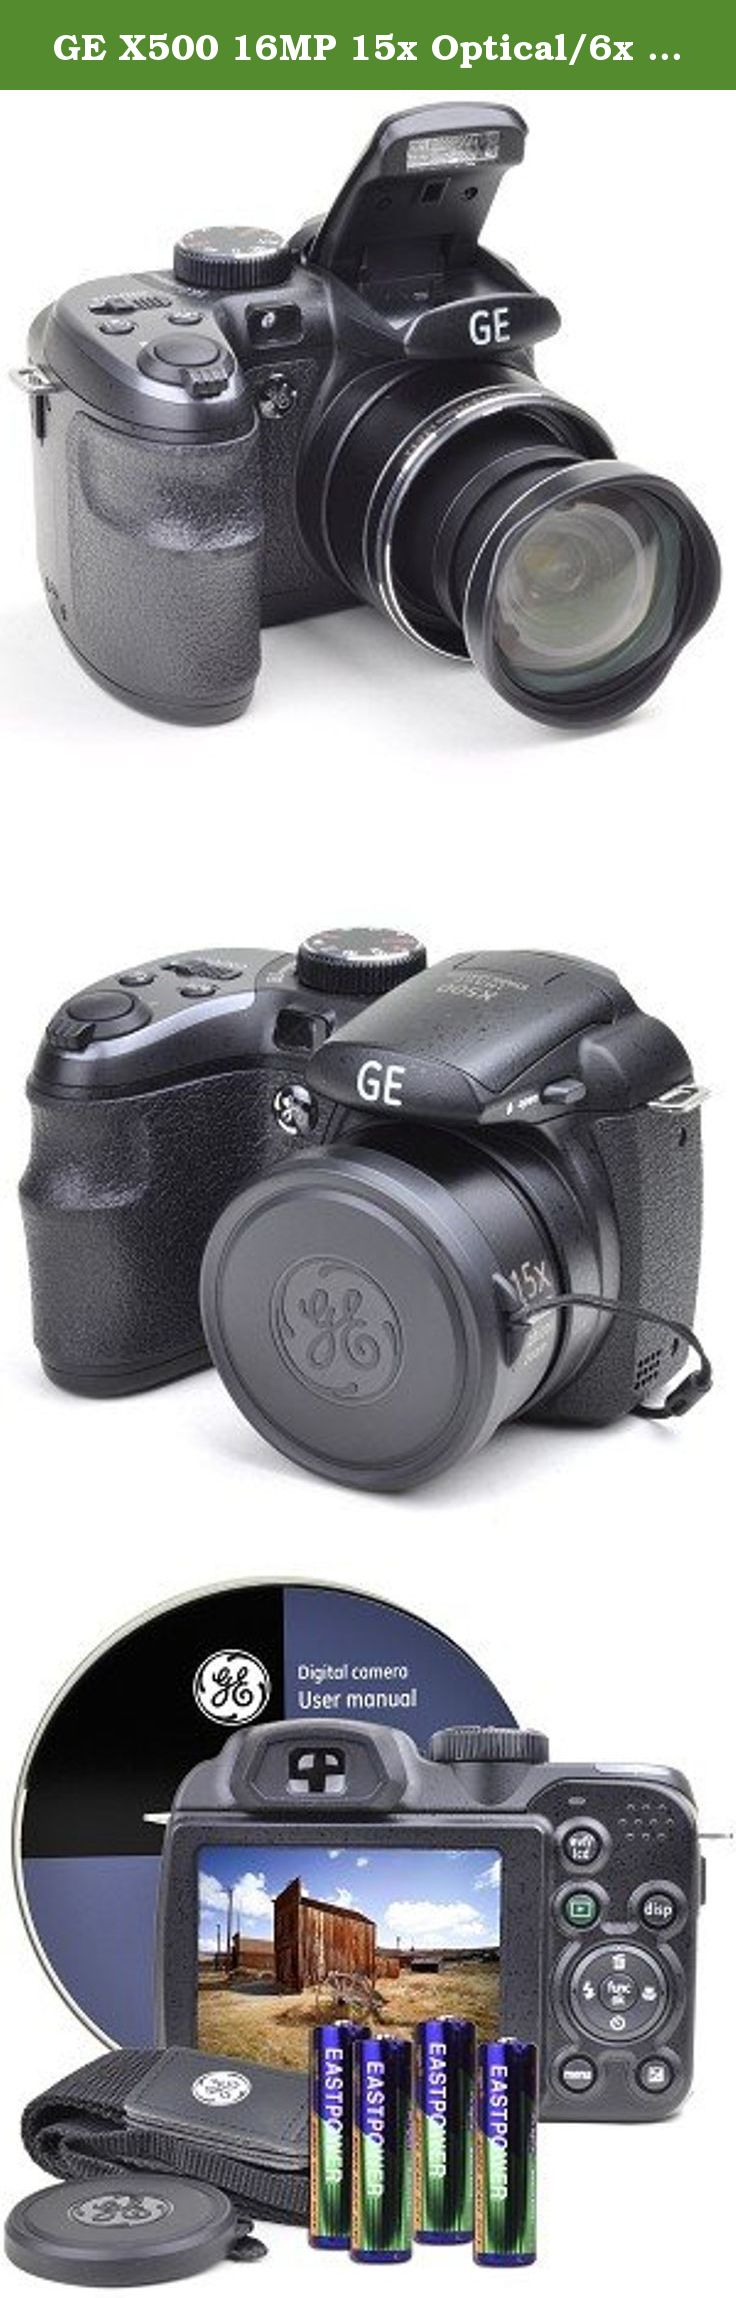 GE X500 16MP 15x Optical/6x Digital Zoom HD Camera Black [Camera].